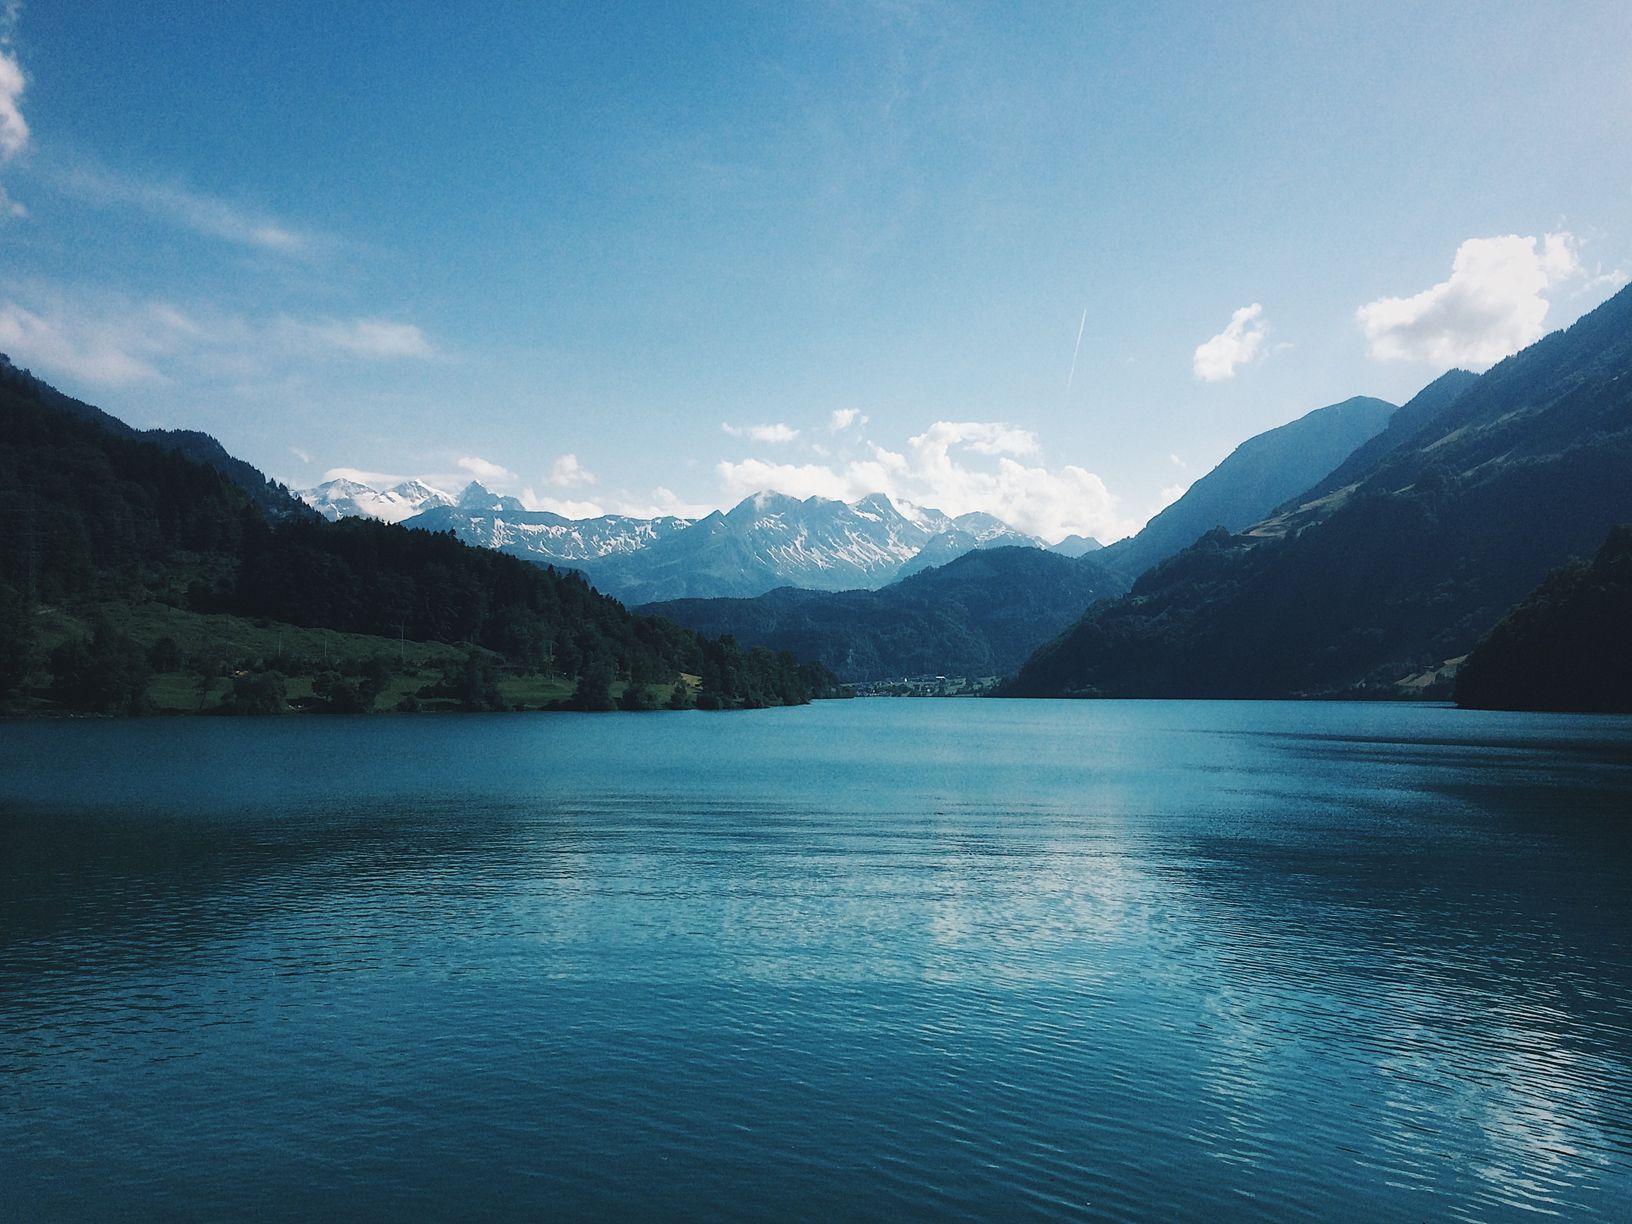 Costs to travel to Switzerland